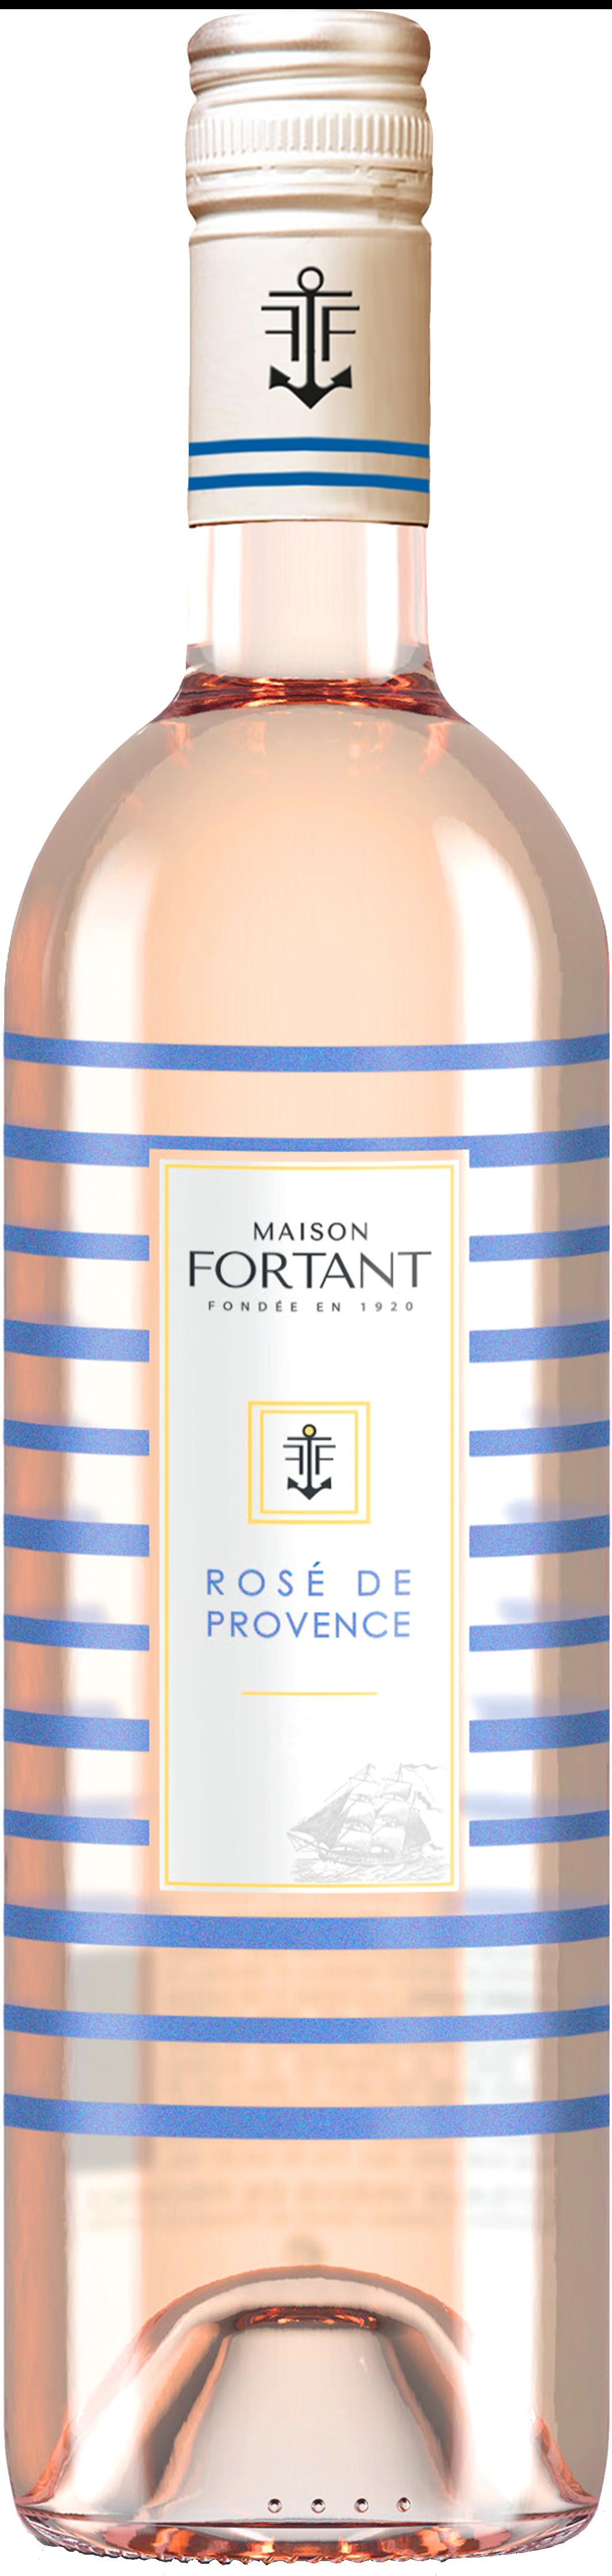 Maison fortant ros de provence brand assets trade for Maison brand